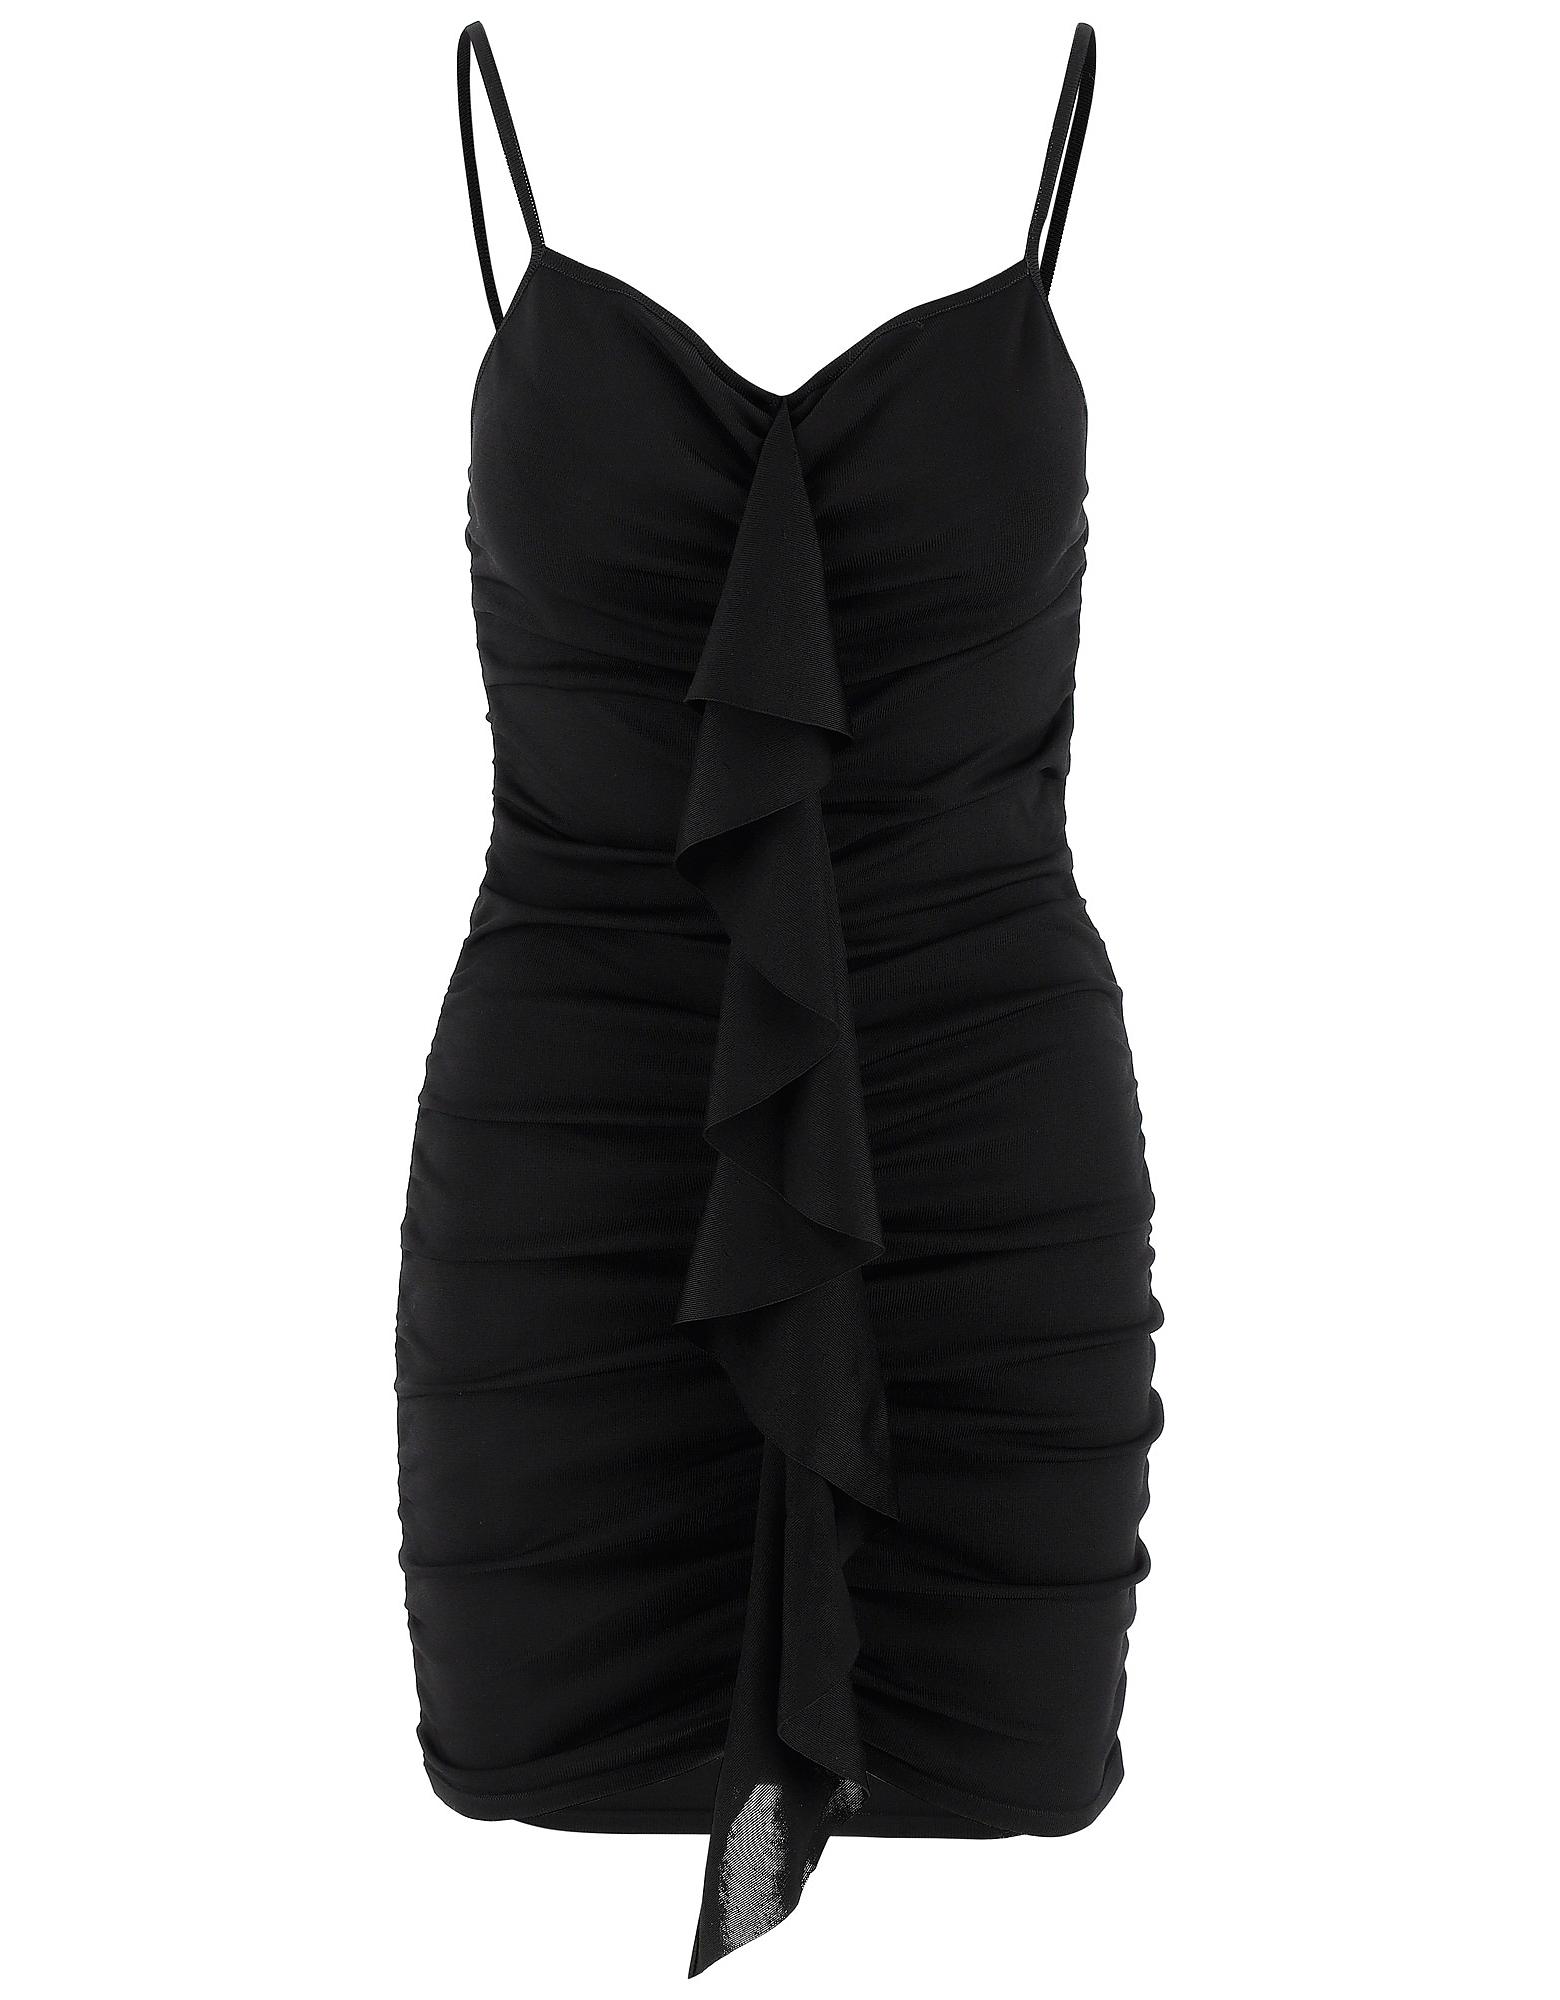 Alexandre Vauthier Designer Dresses & Jumpsuits, Black Stretch Viscose Women's Mini Dress